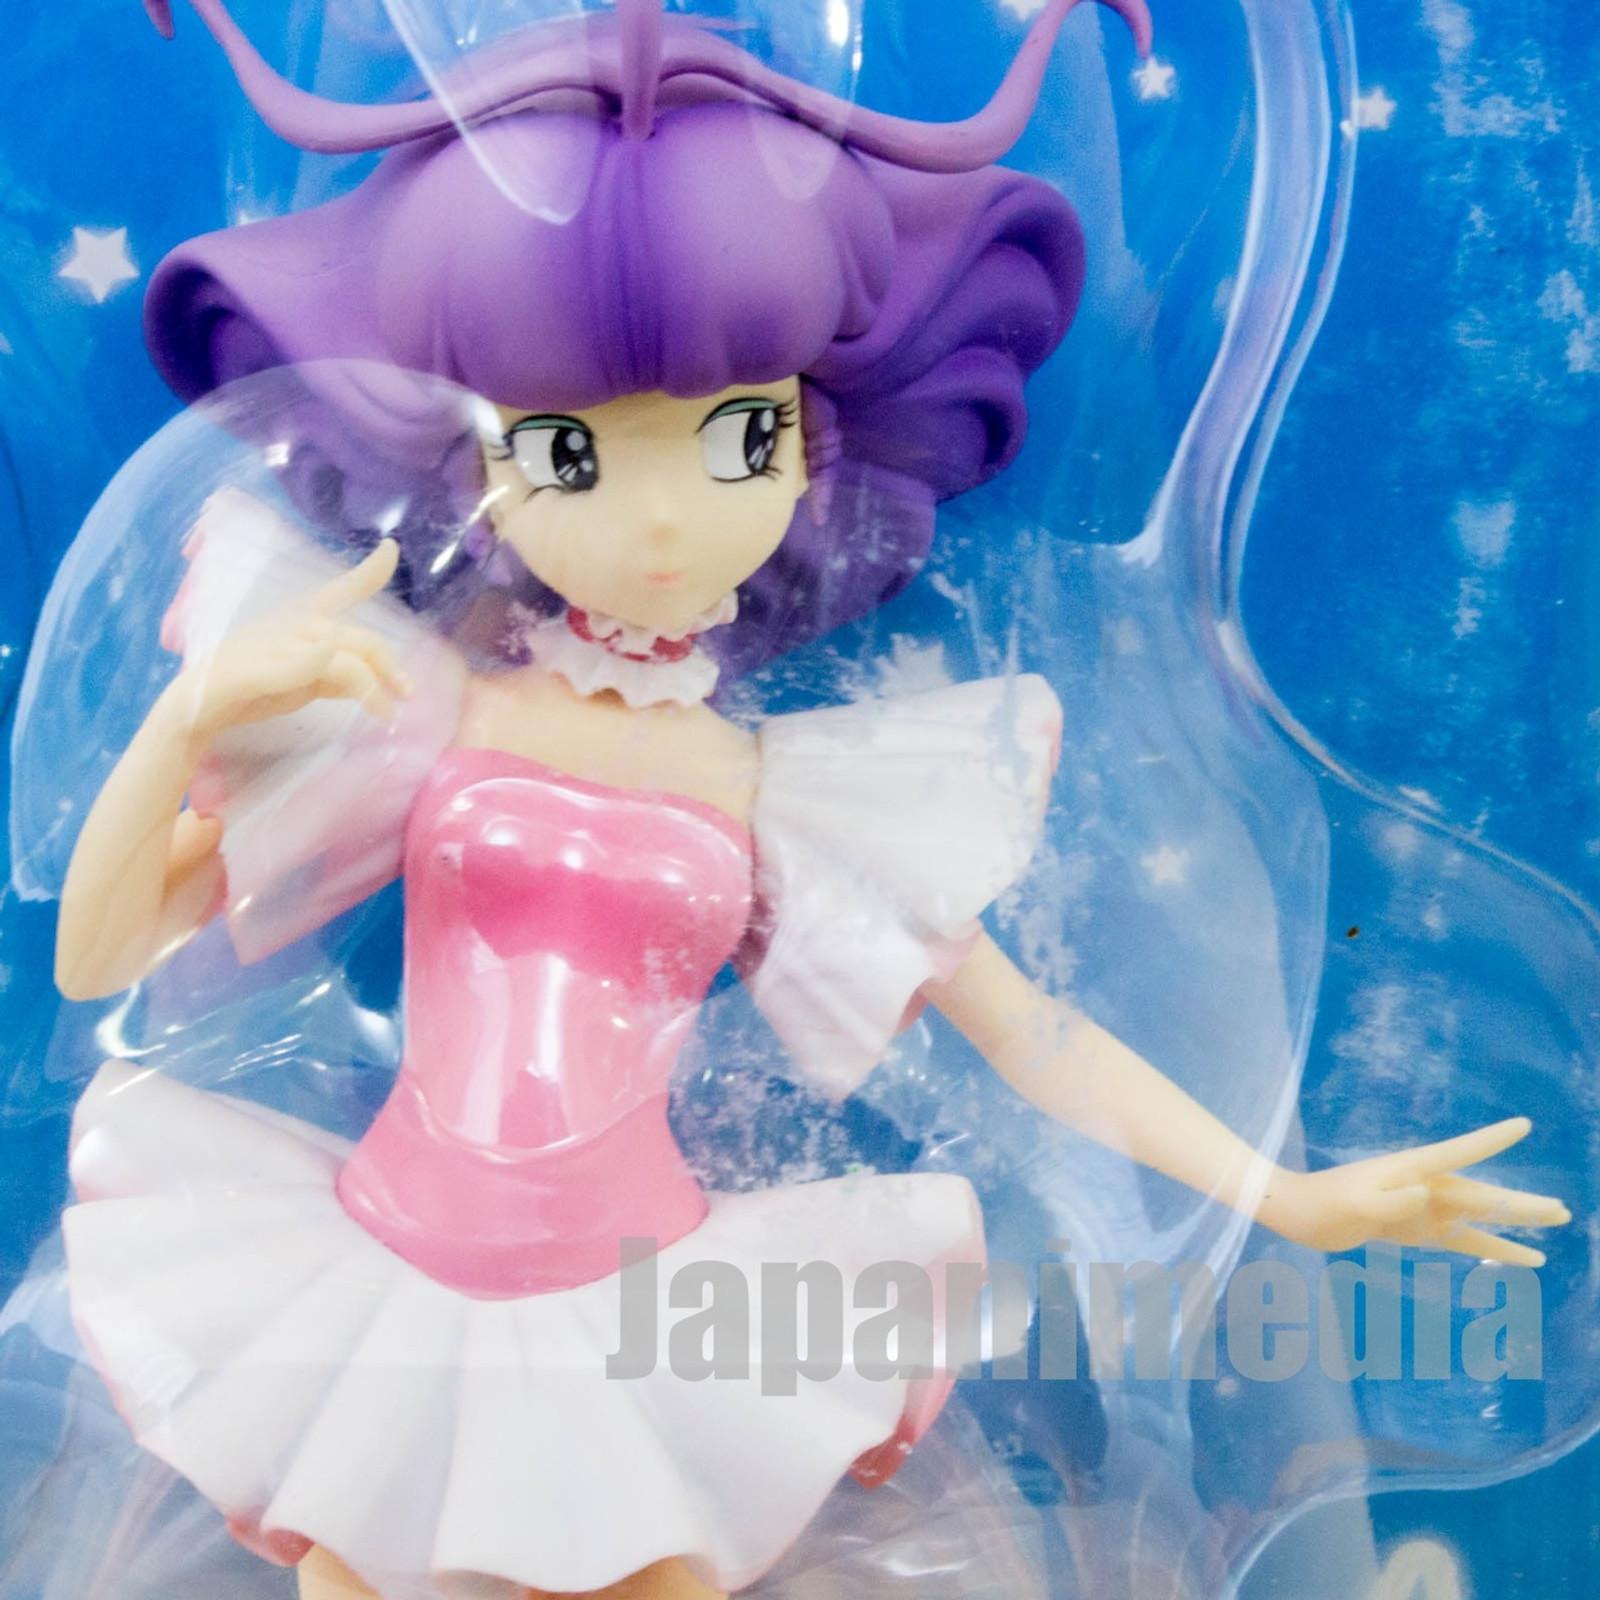 Magic Angel Creamy Mami Big Figure Part.2 Pink ver. JAPAN ANIME MANGA